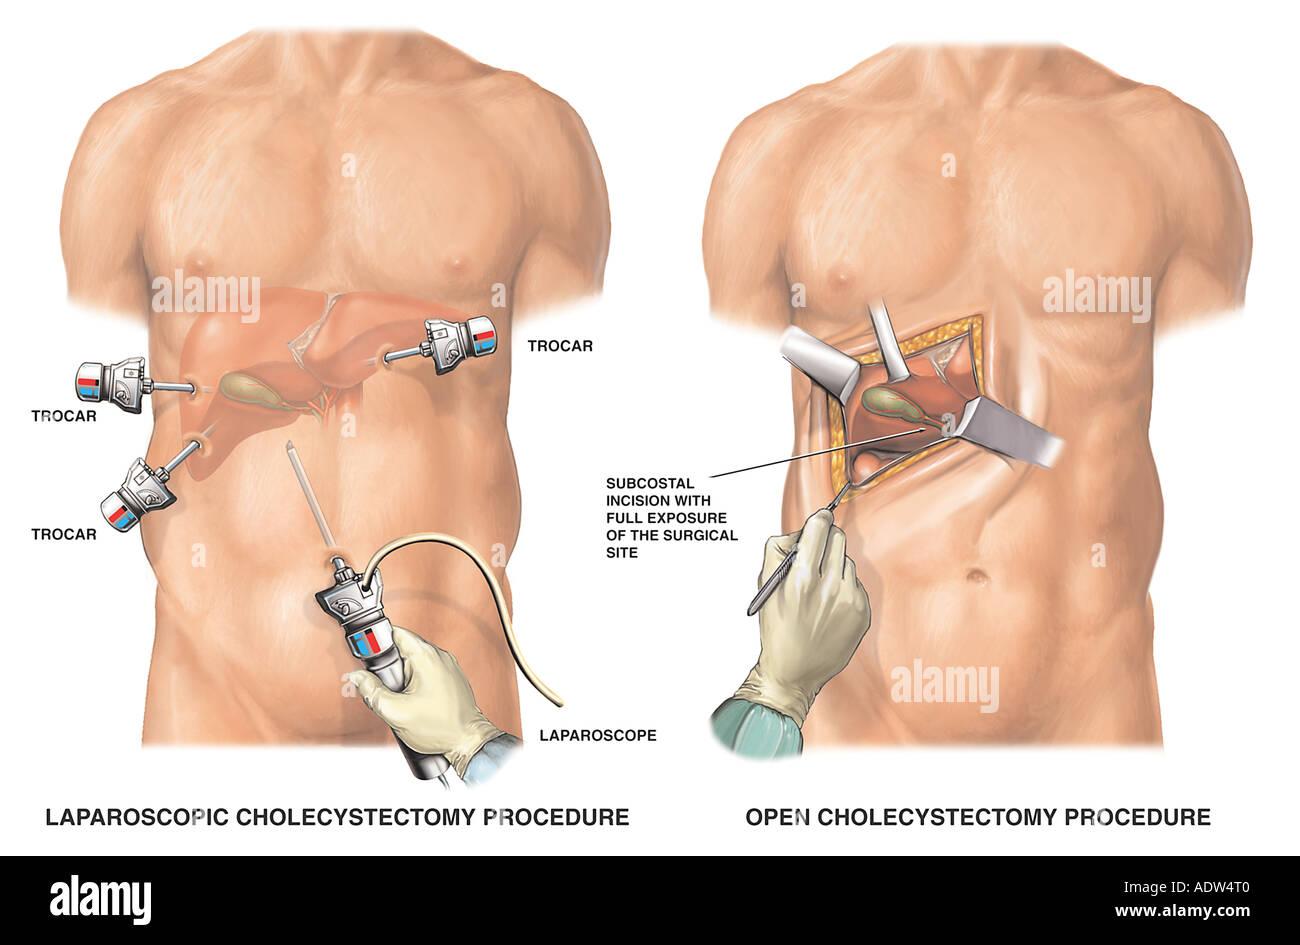 Cholecystectomy Imágenes De Stock & Cholecystectomy Fotos De Stock ...